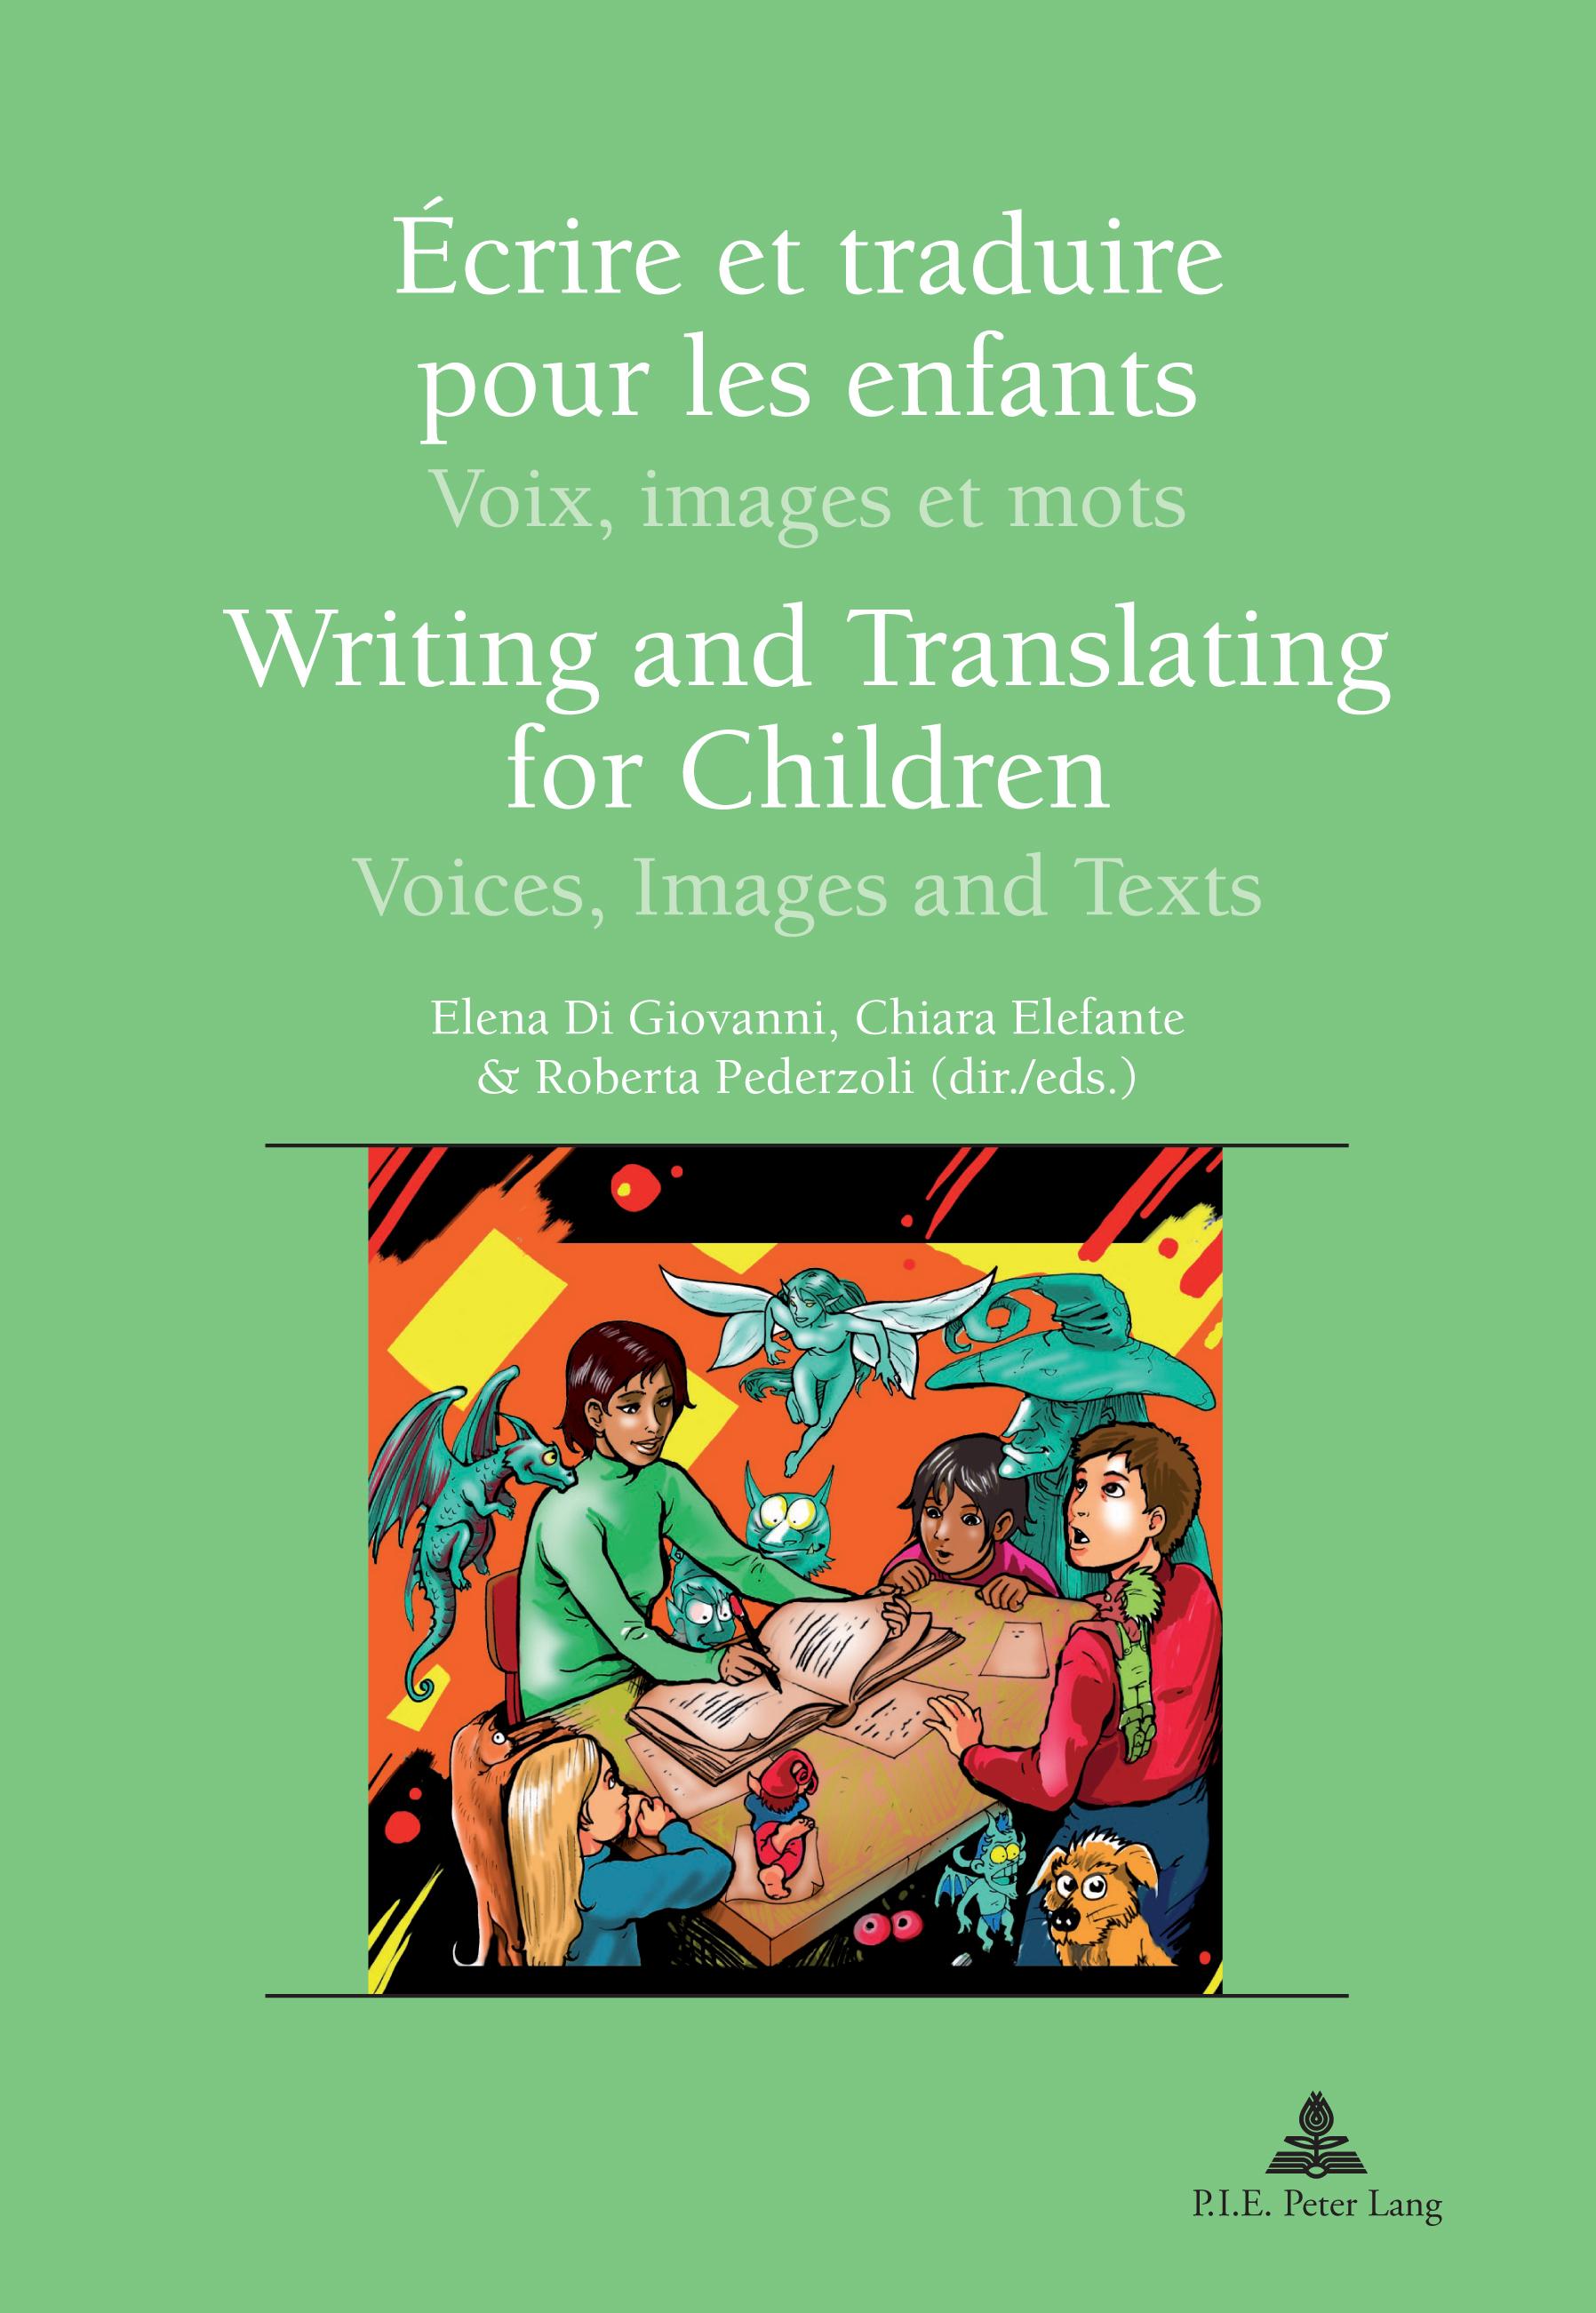 ECRIRE ET TRADUIRE POUR LES ENFANTS/WRITING AND TRANSLATING FOR CHRILDREN